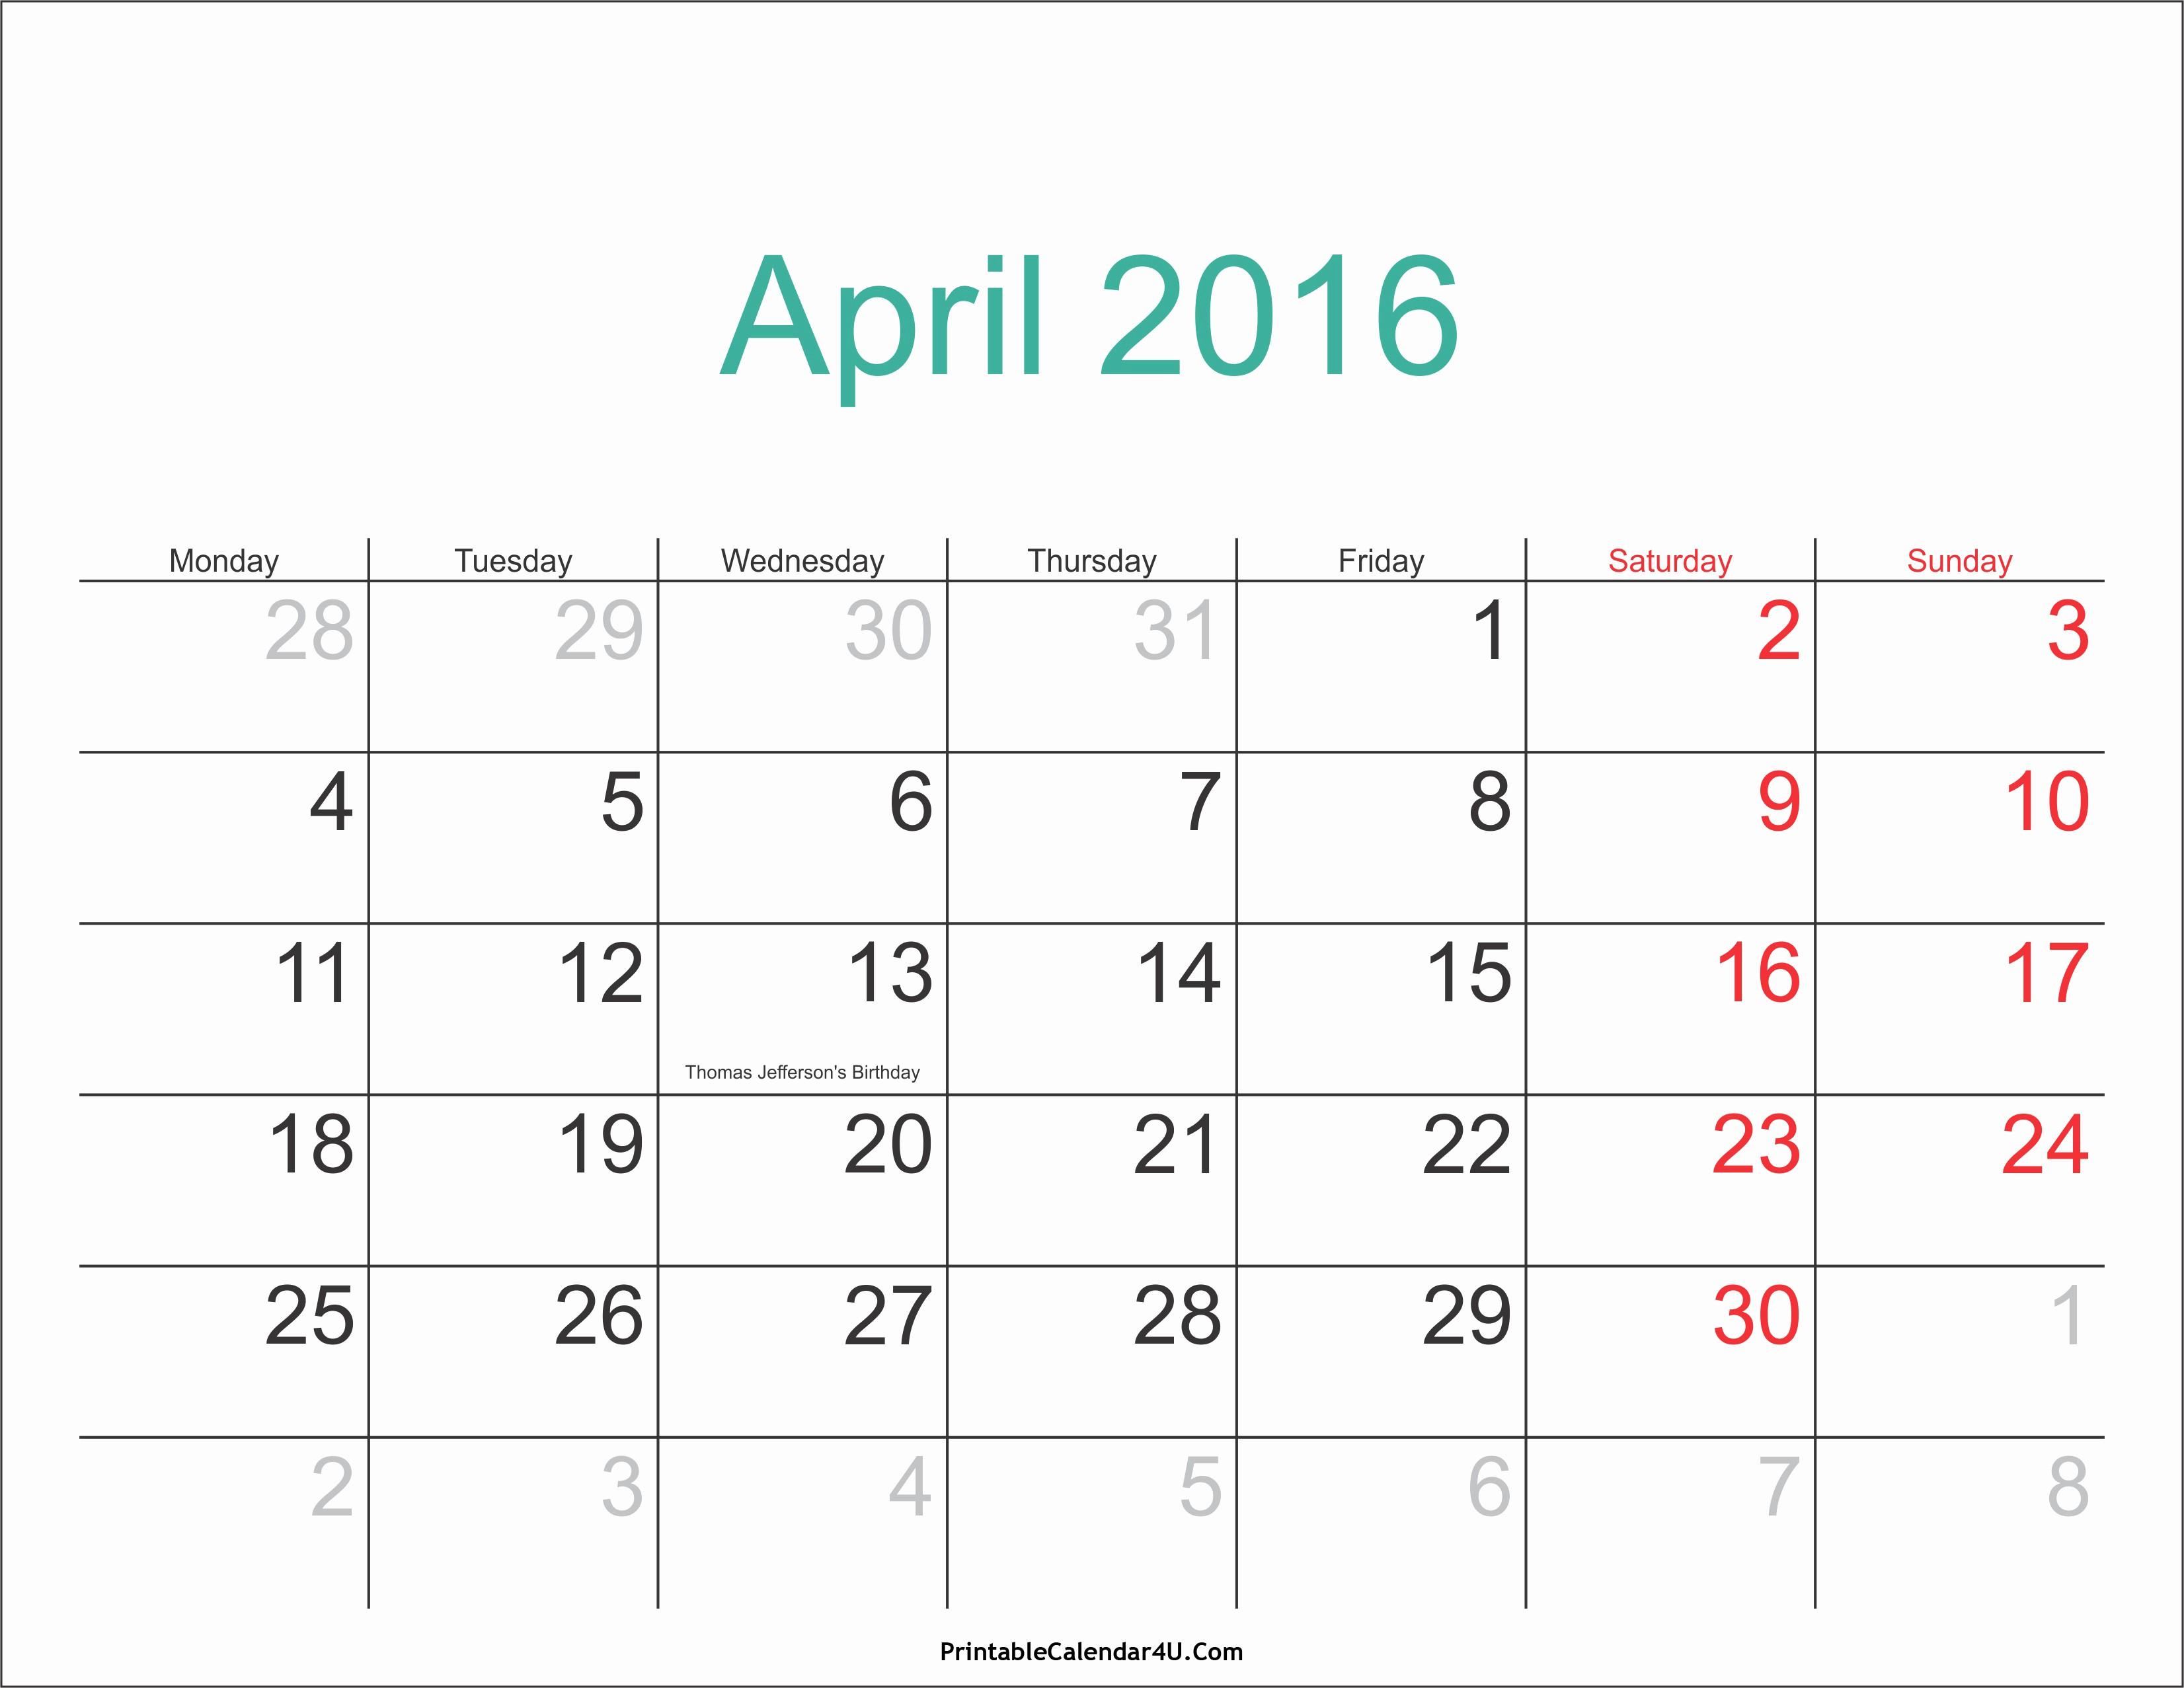 Calendar 2016 Printable with Holidays Luxury April 2016 Calendar Printable with Holidays Pdf and Jpg